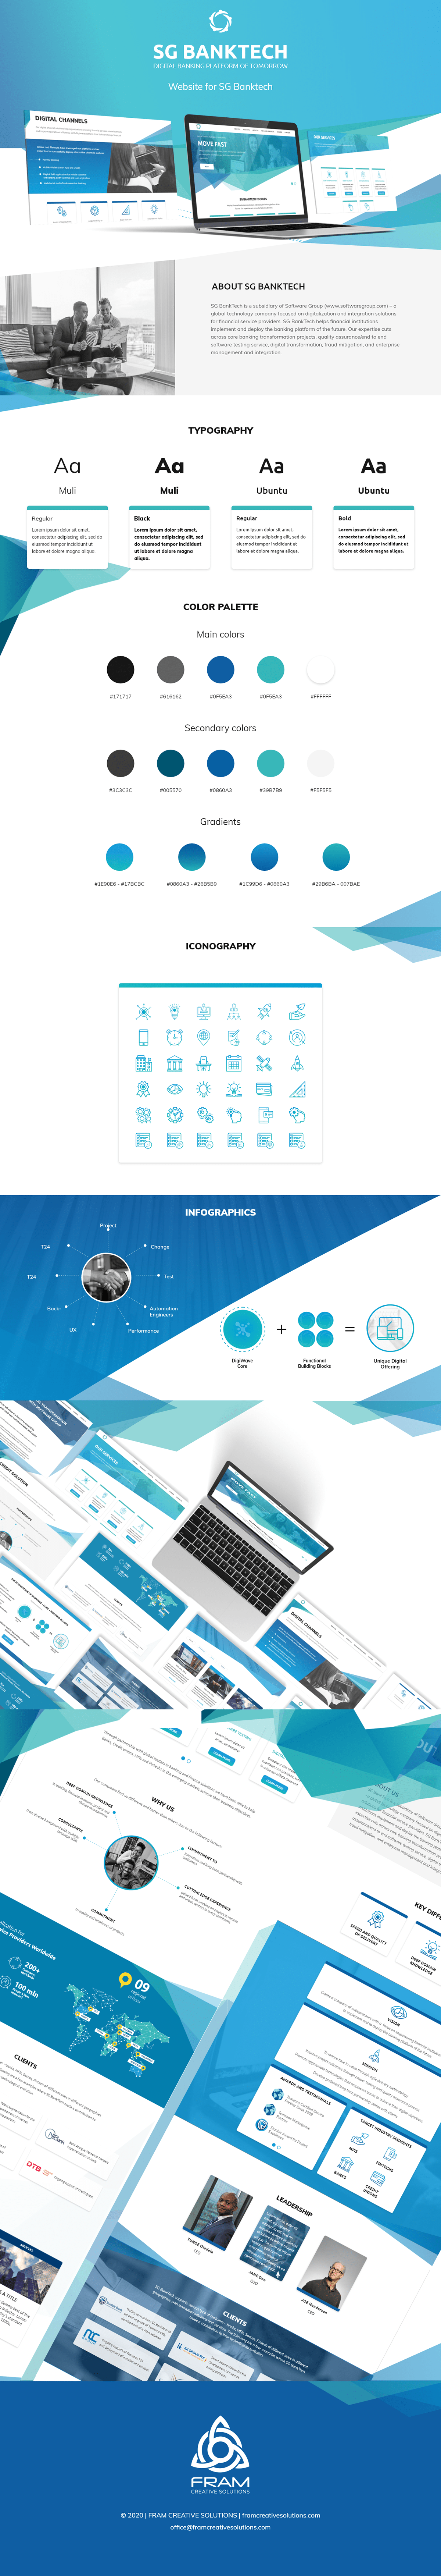 branding  UI ux ux/ui Webdesign Website